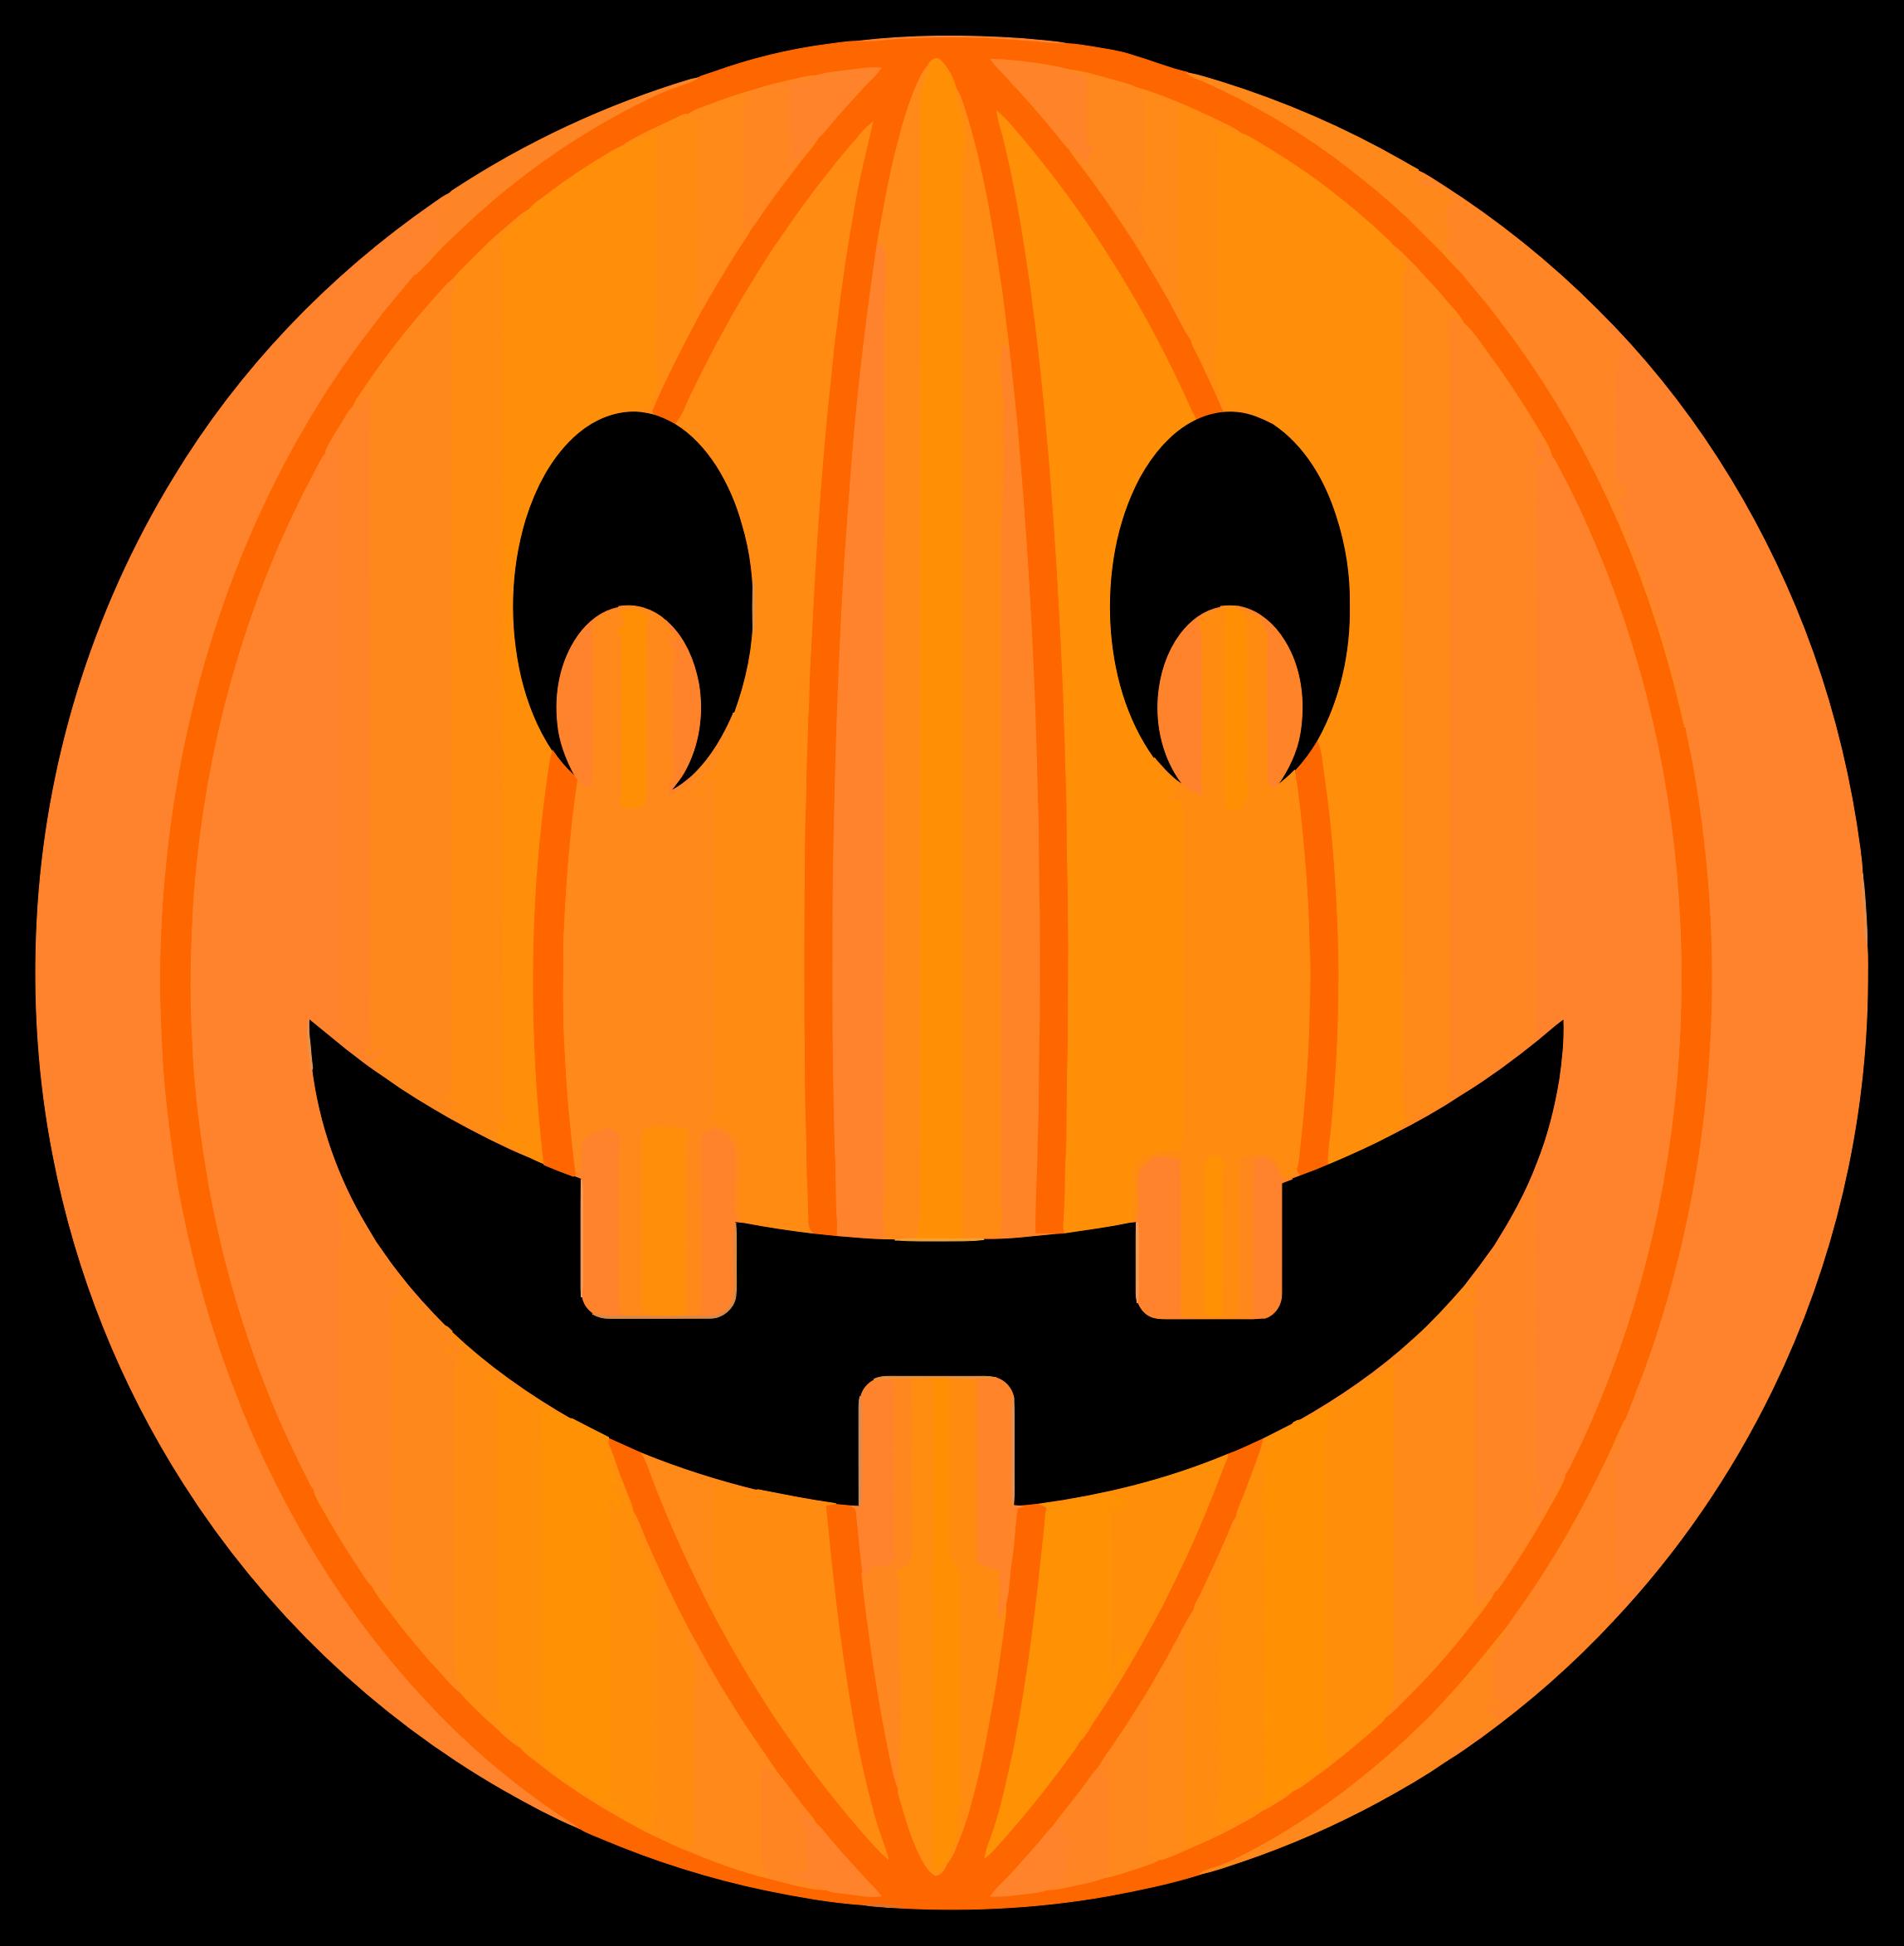 Halloween jack o lantern clipart free library Jack O Lantern Clipart Halloween Jack free library